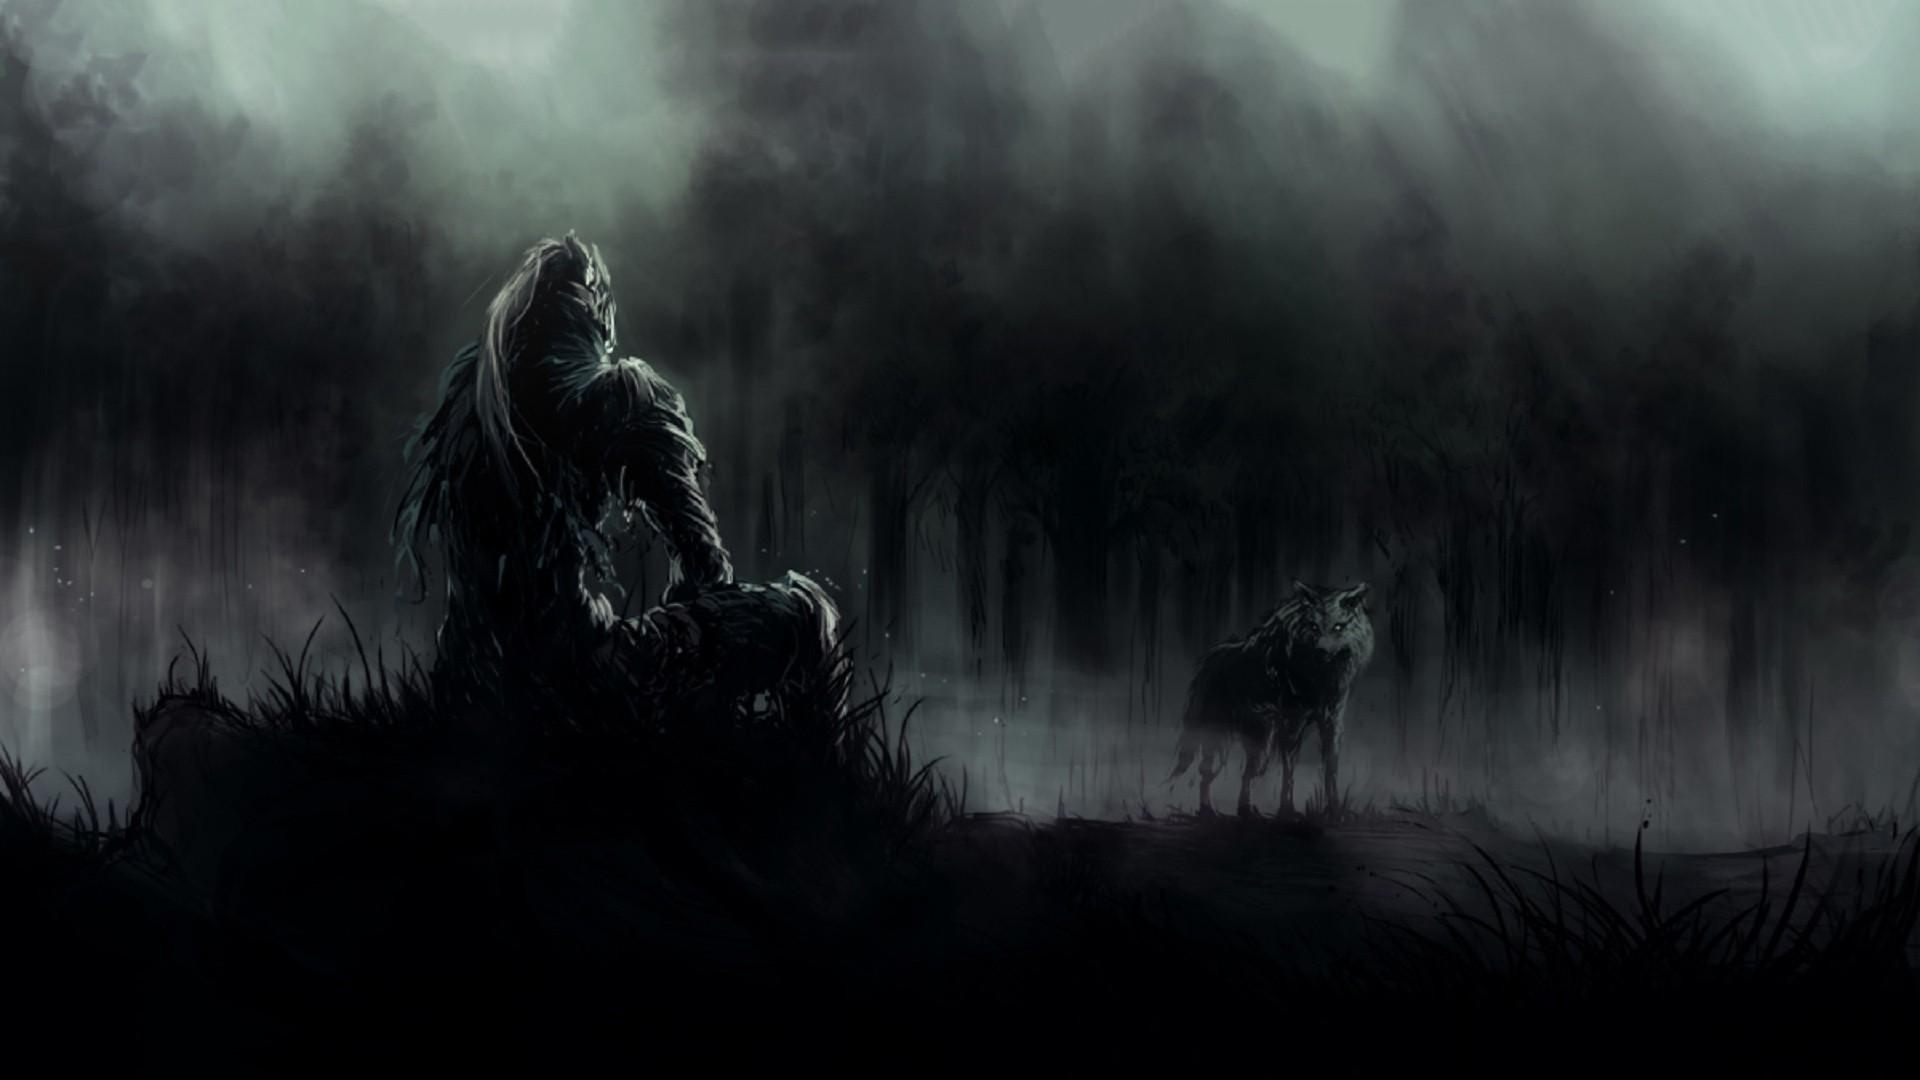 Dark Souls Animated Wallpaper Wallpaper 1920x1080 Px Artorias Dark Souls Video